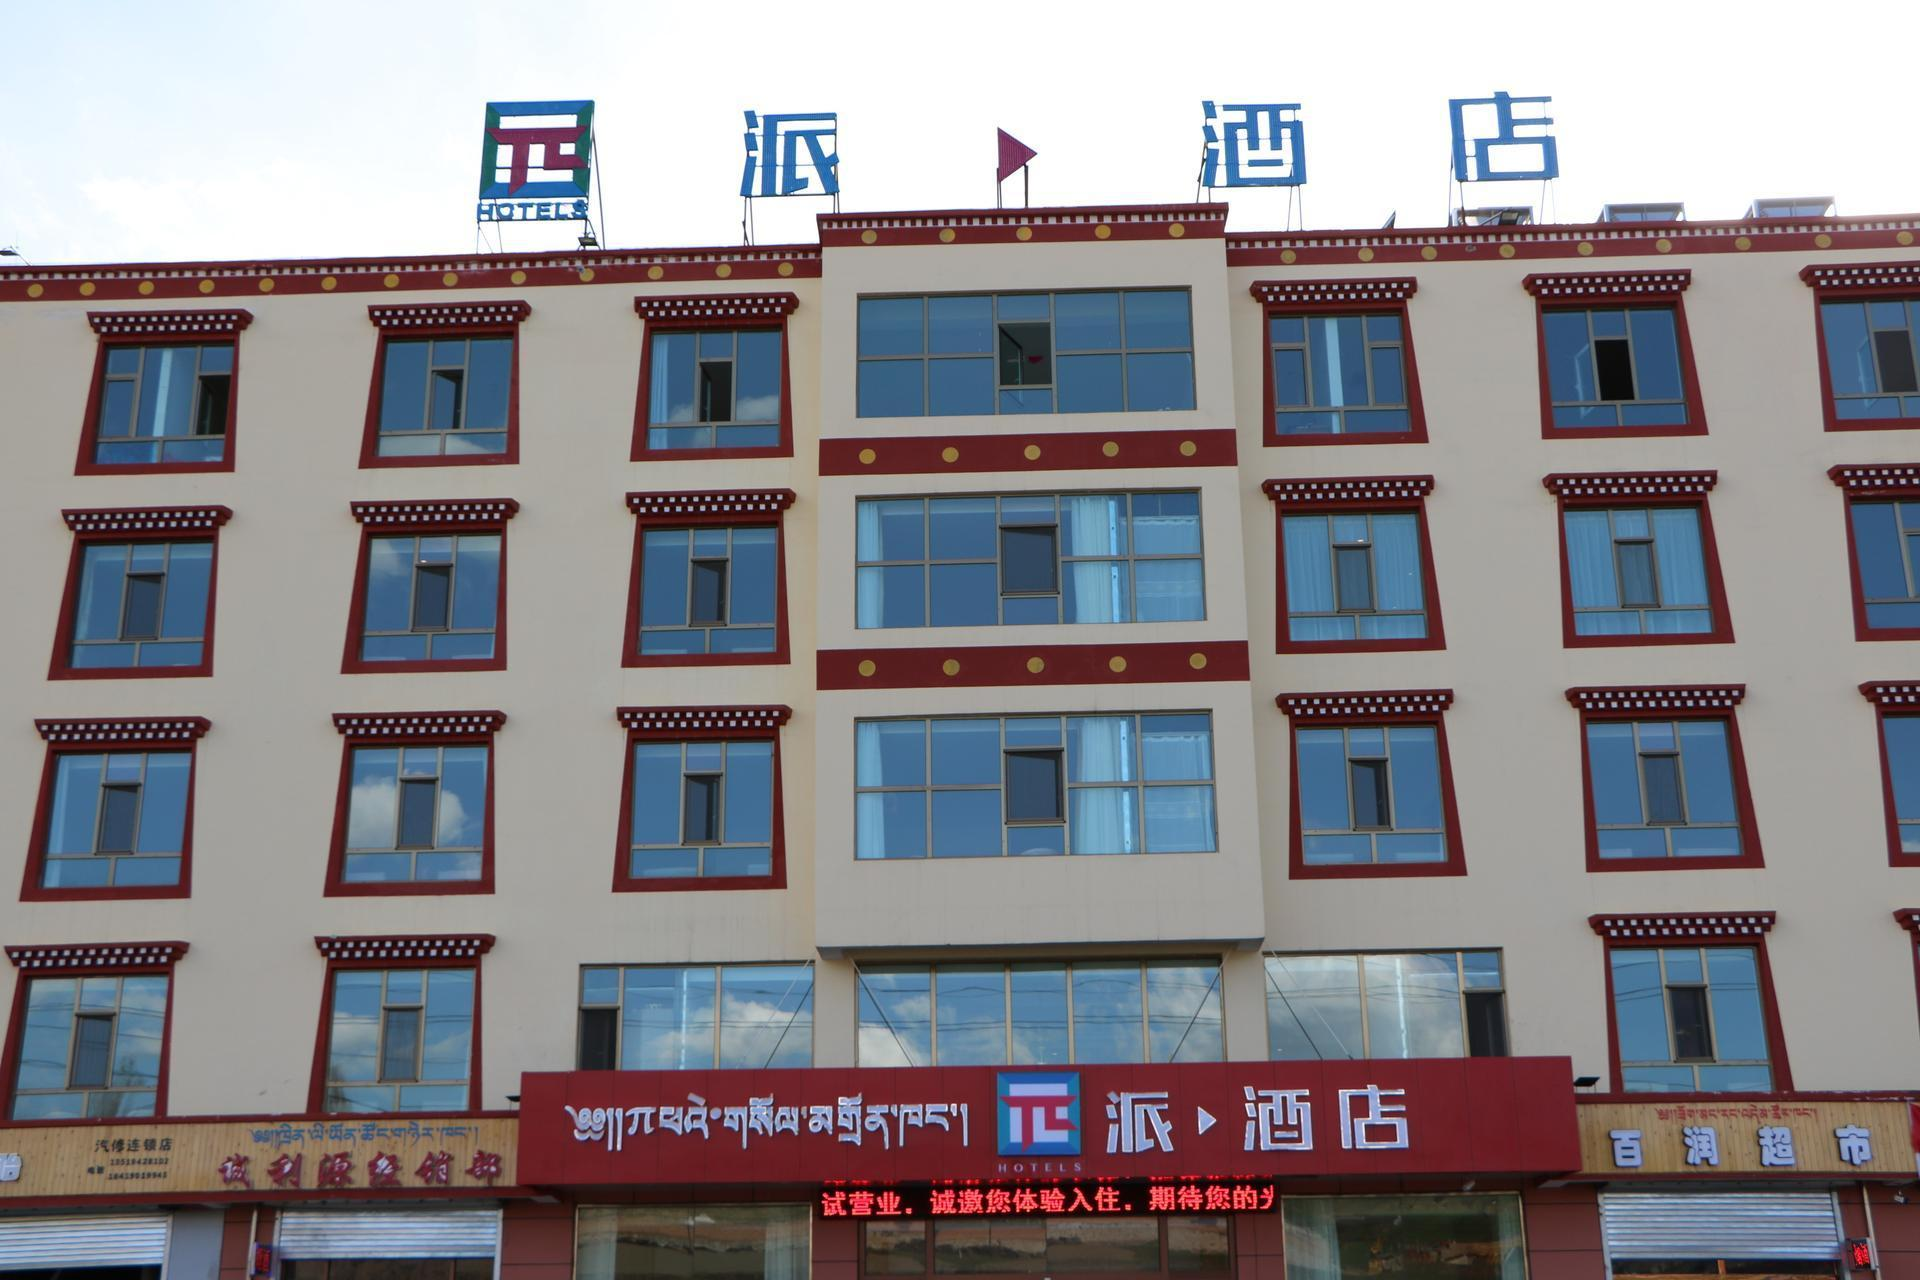 Pai Hotel Gannan Cooperative bus company, Gannan Tibetan